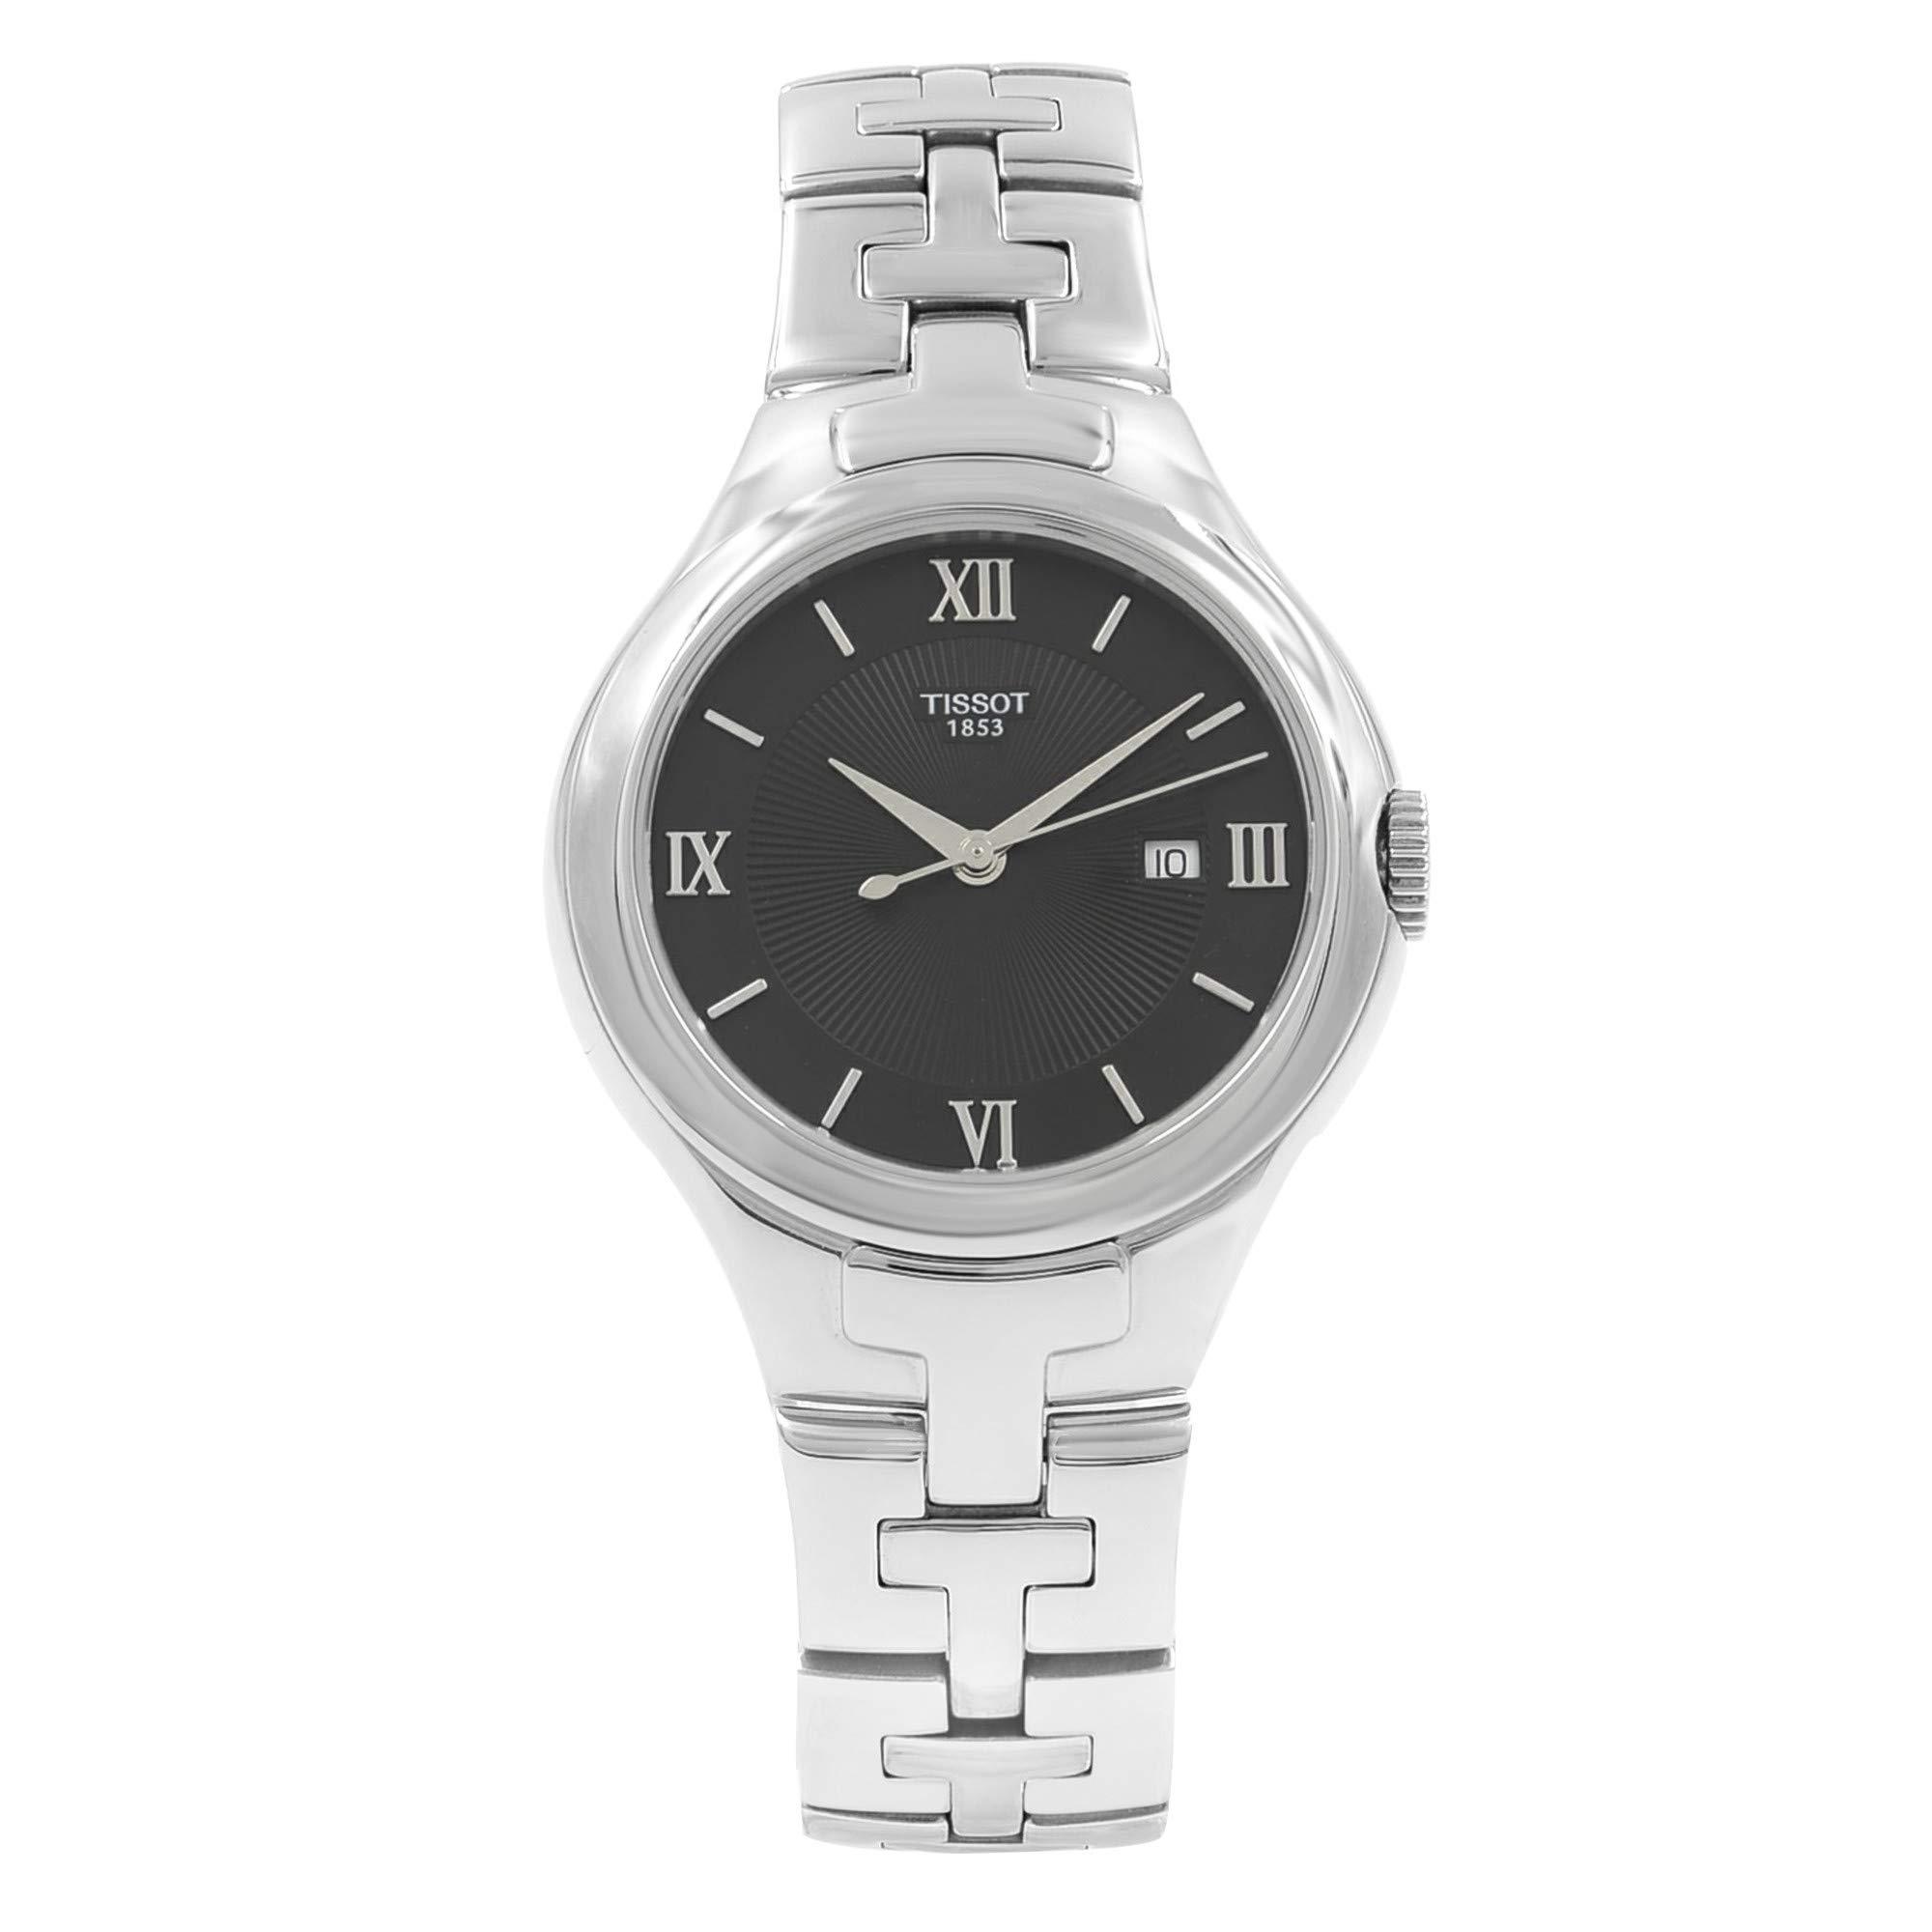 Tissot T12 Quartz Female Watch T082.210.11.058.00 (Certified Pre-Owned) by Tissot